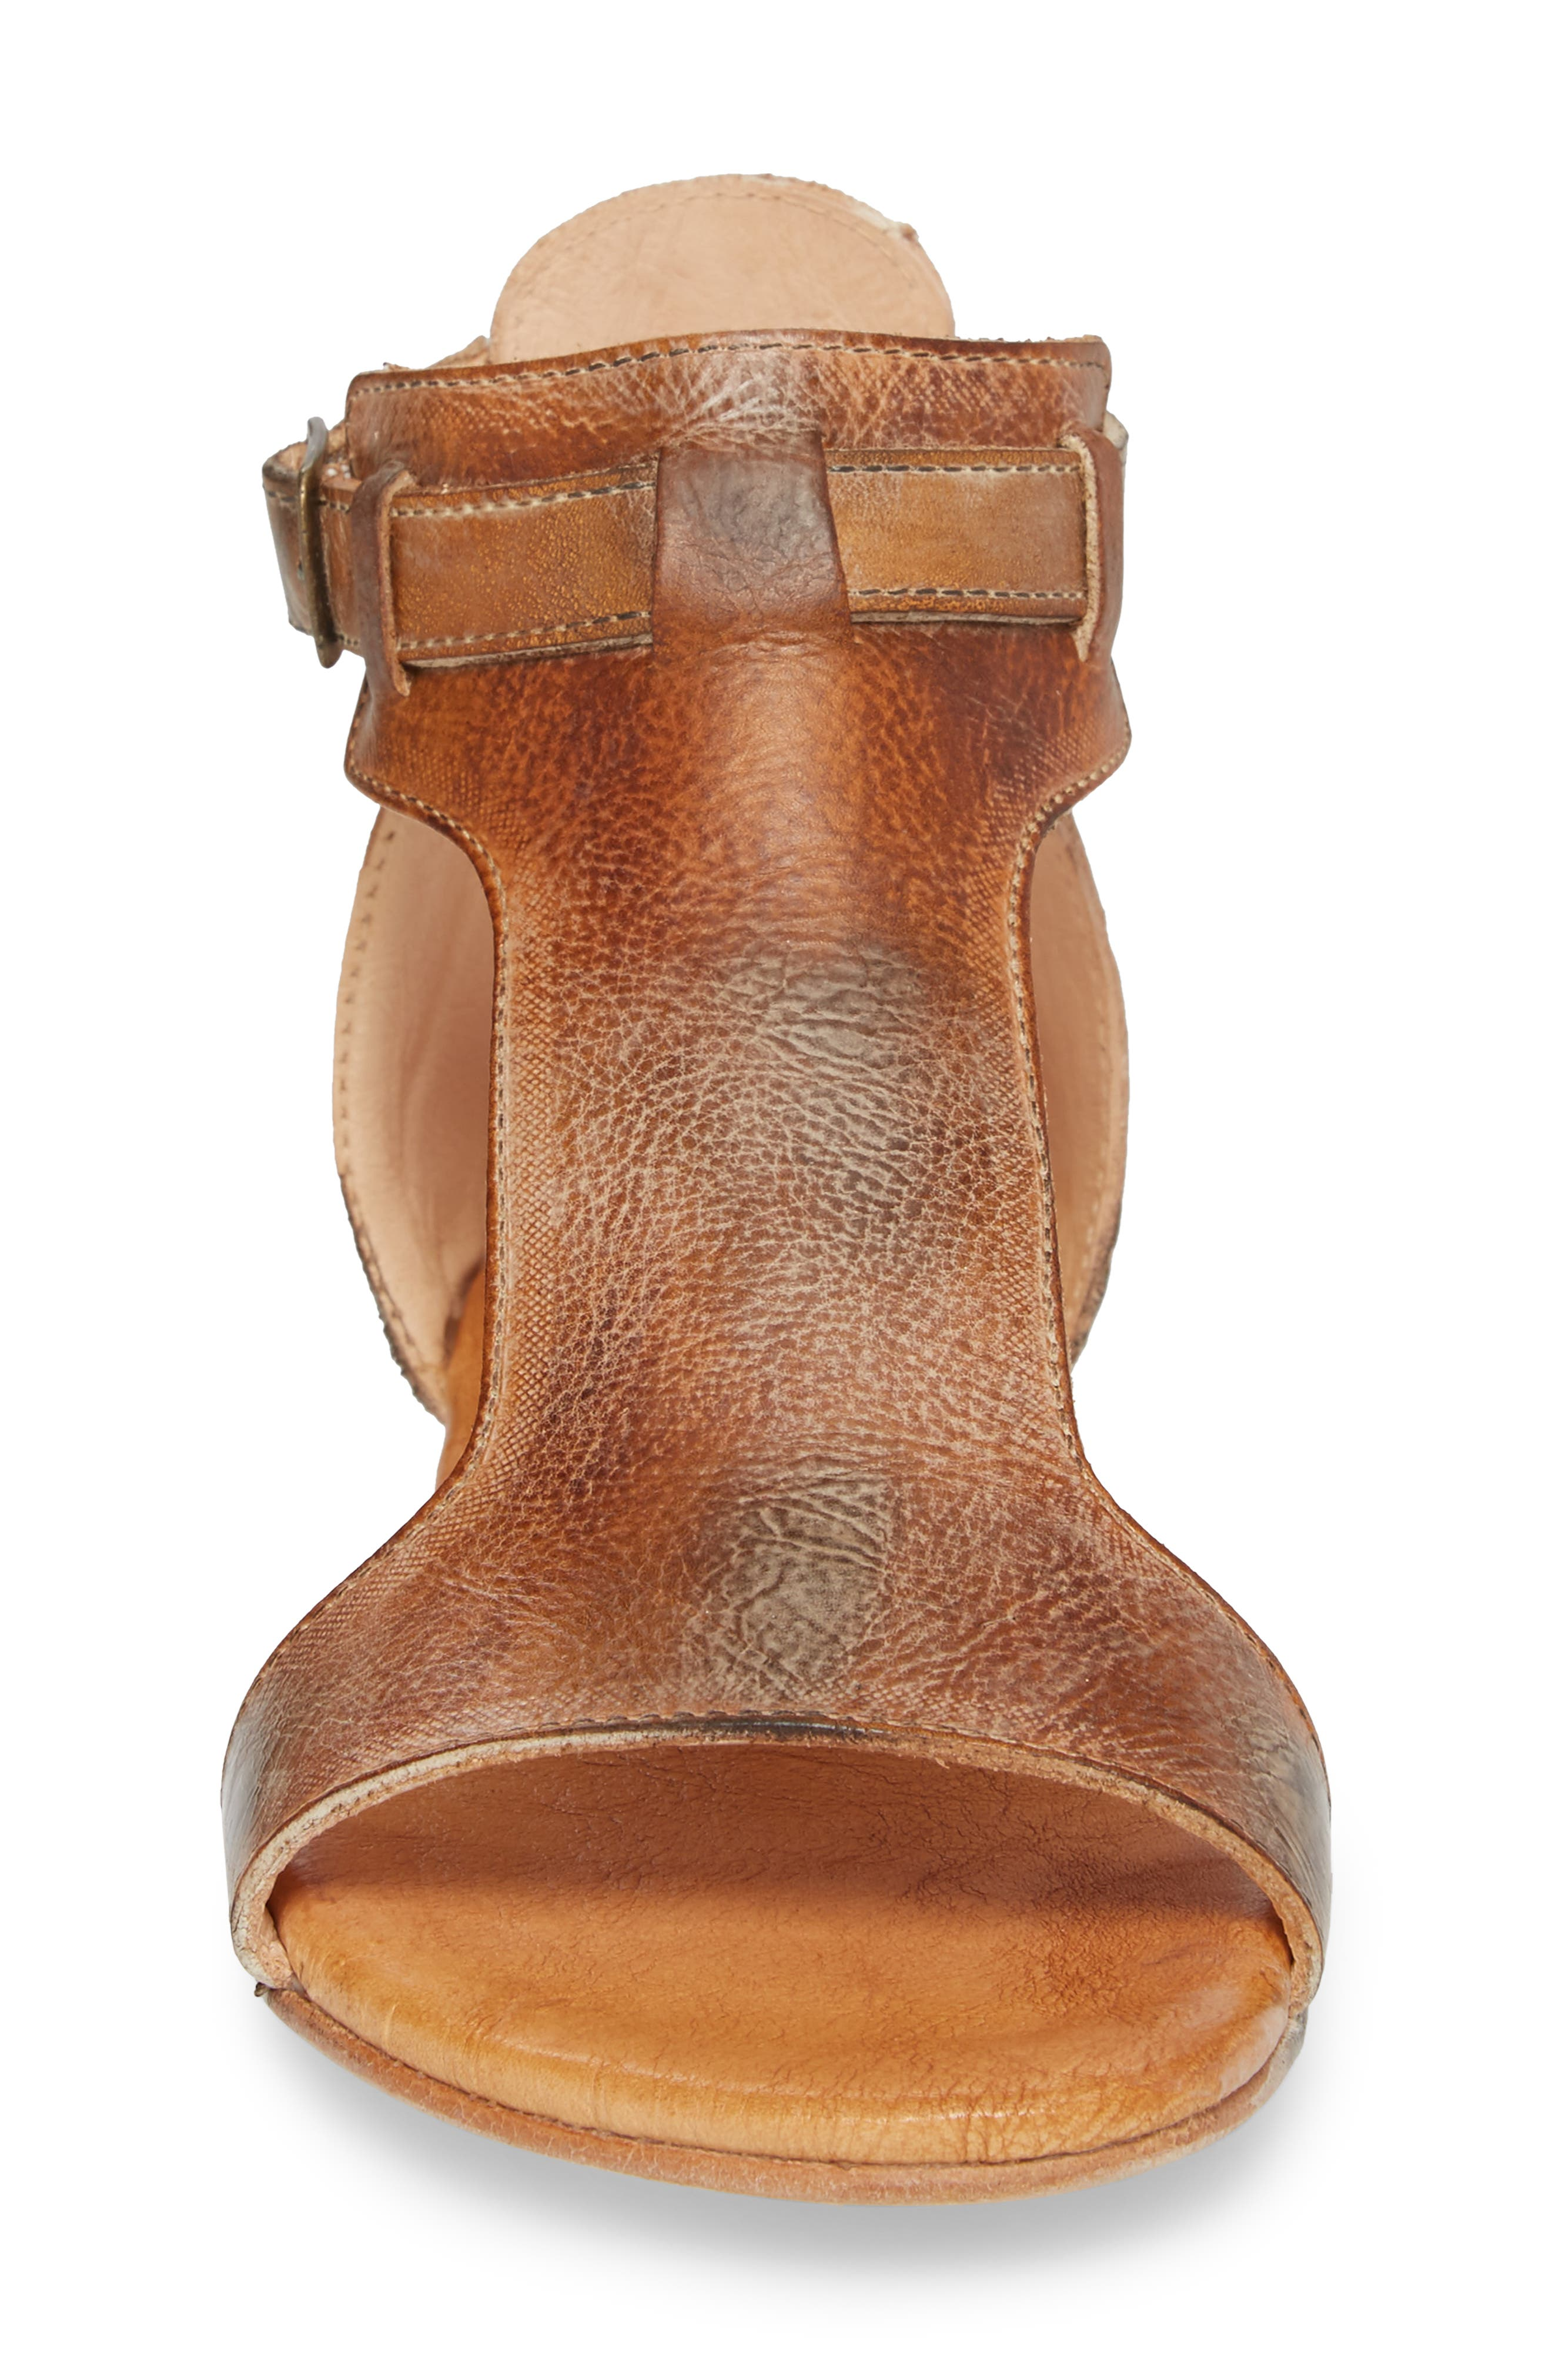 Sable Sandal,                             Alternate thumbnail 4, color,                             Tan/ White Leather